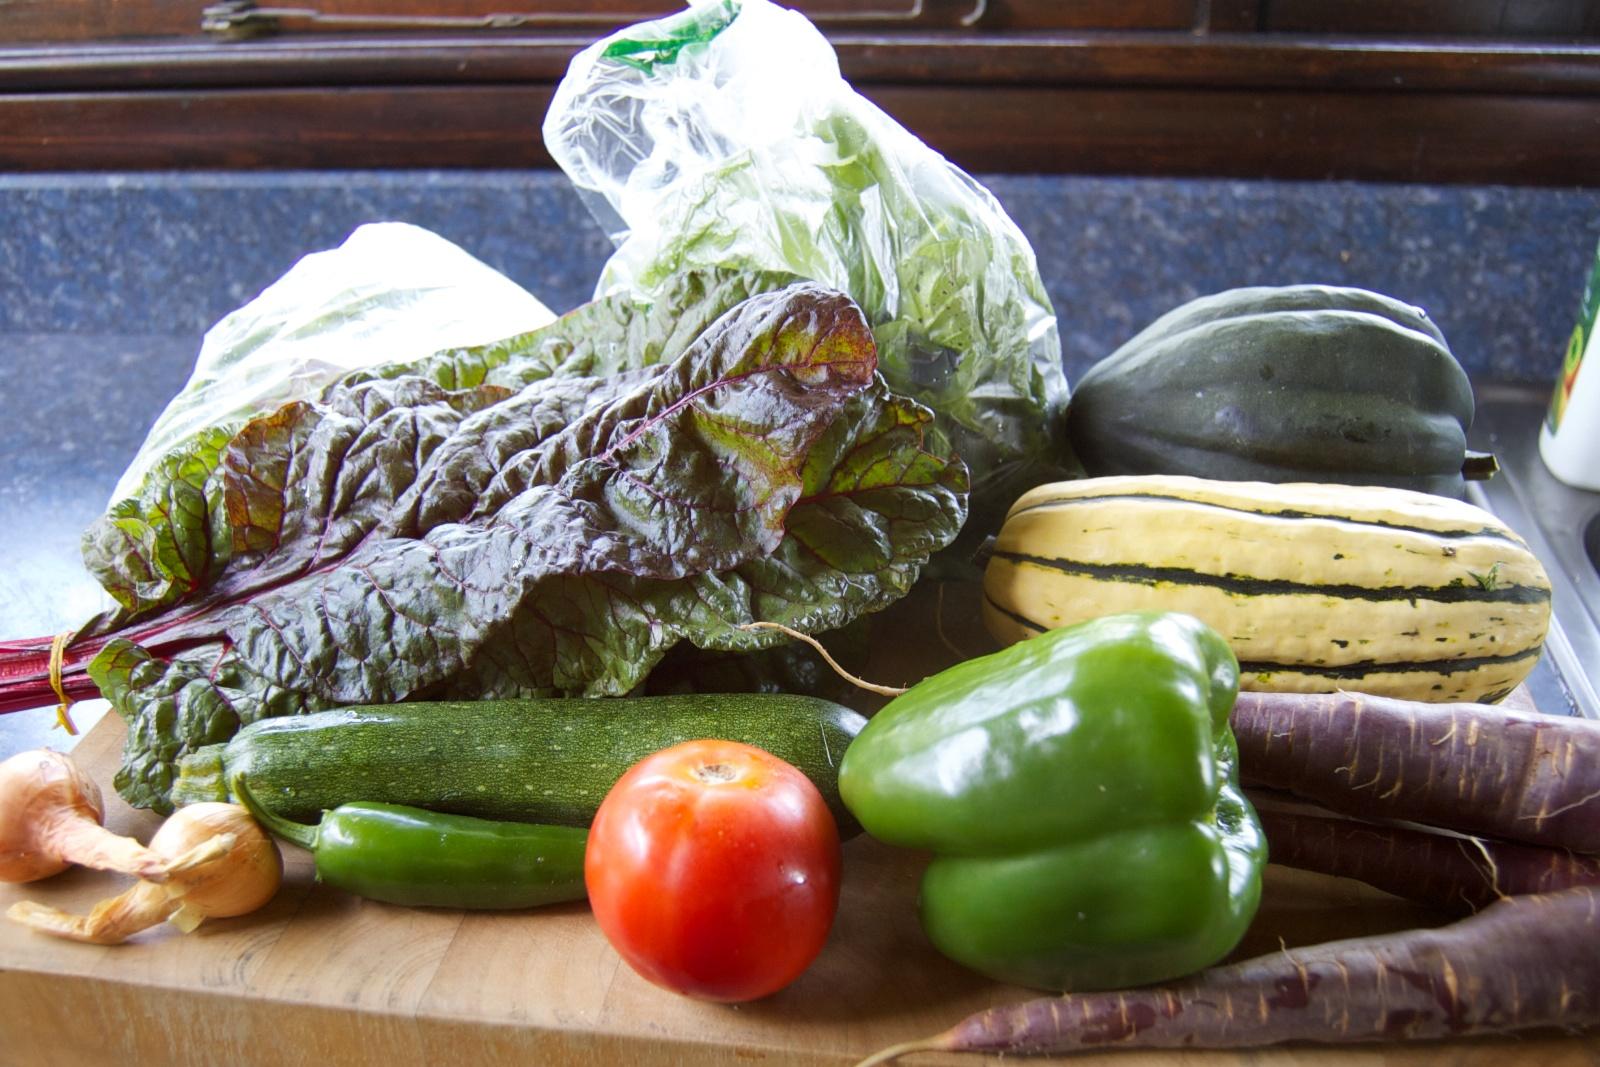 http://blog.rickk.com/food/2014/09/10/csa.2014.14.1.jpg